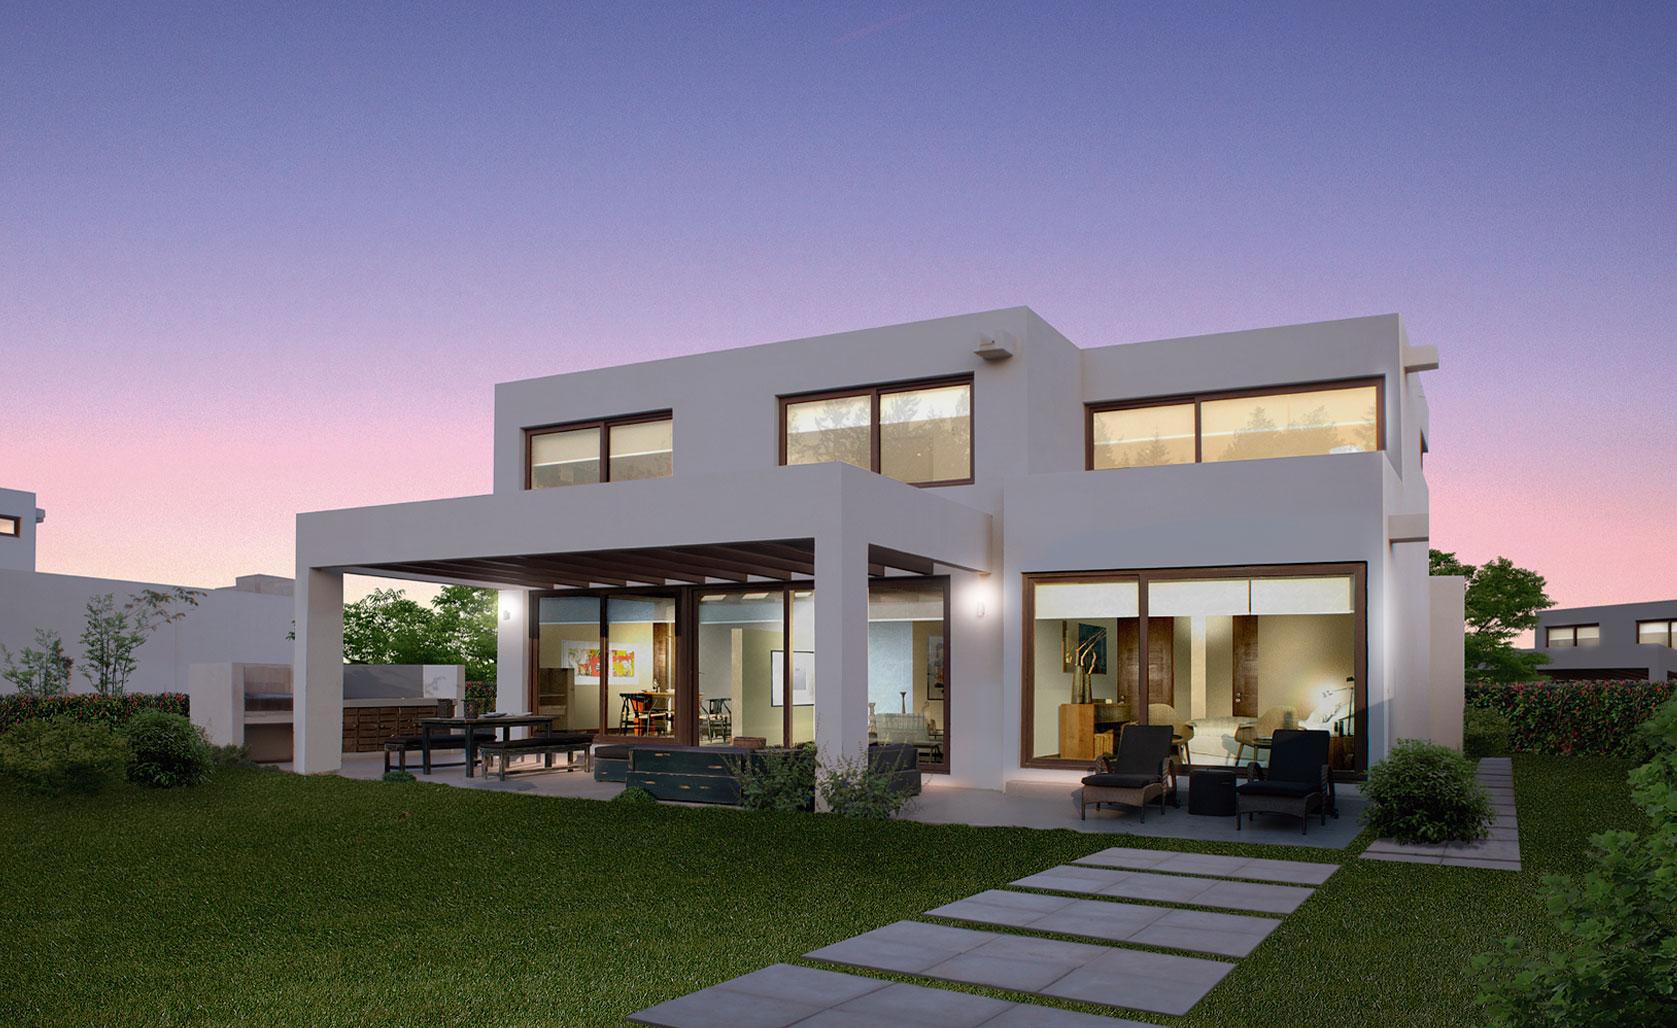 Aguas claras colina av jos rabat 9620 piedra roja for Casa moderna 140 m2